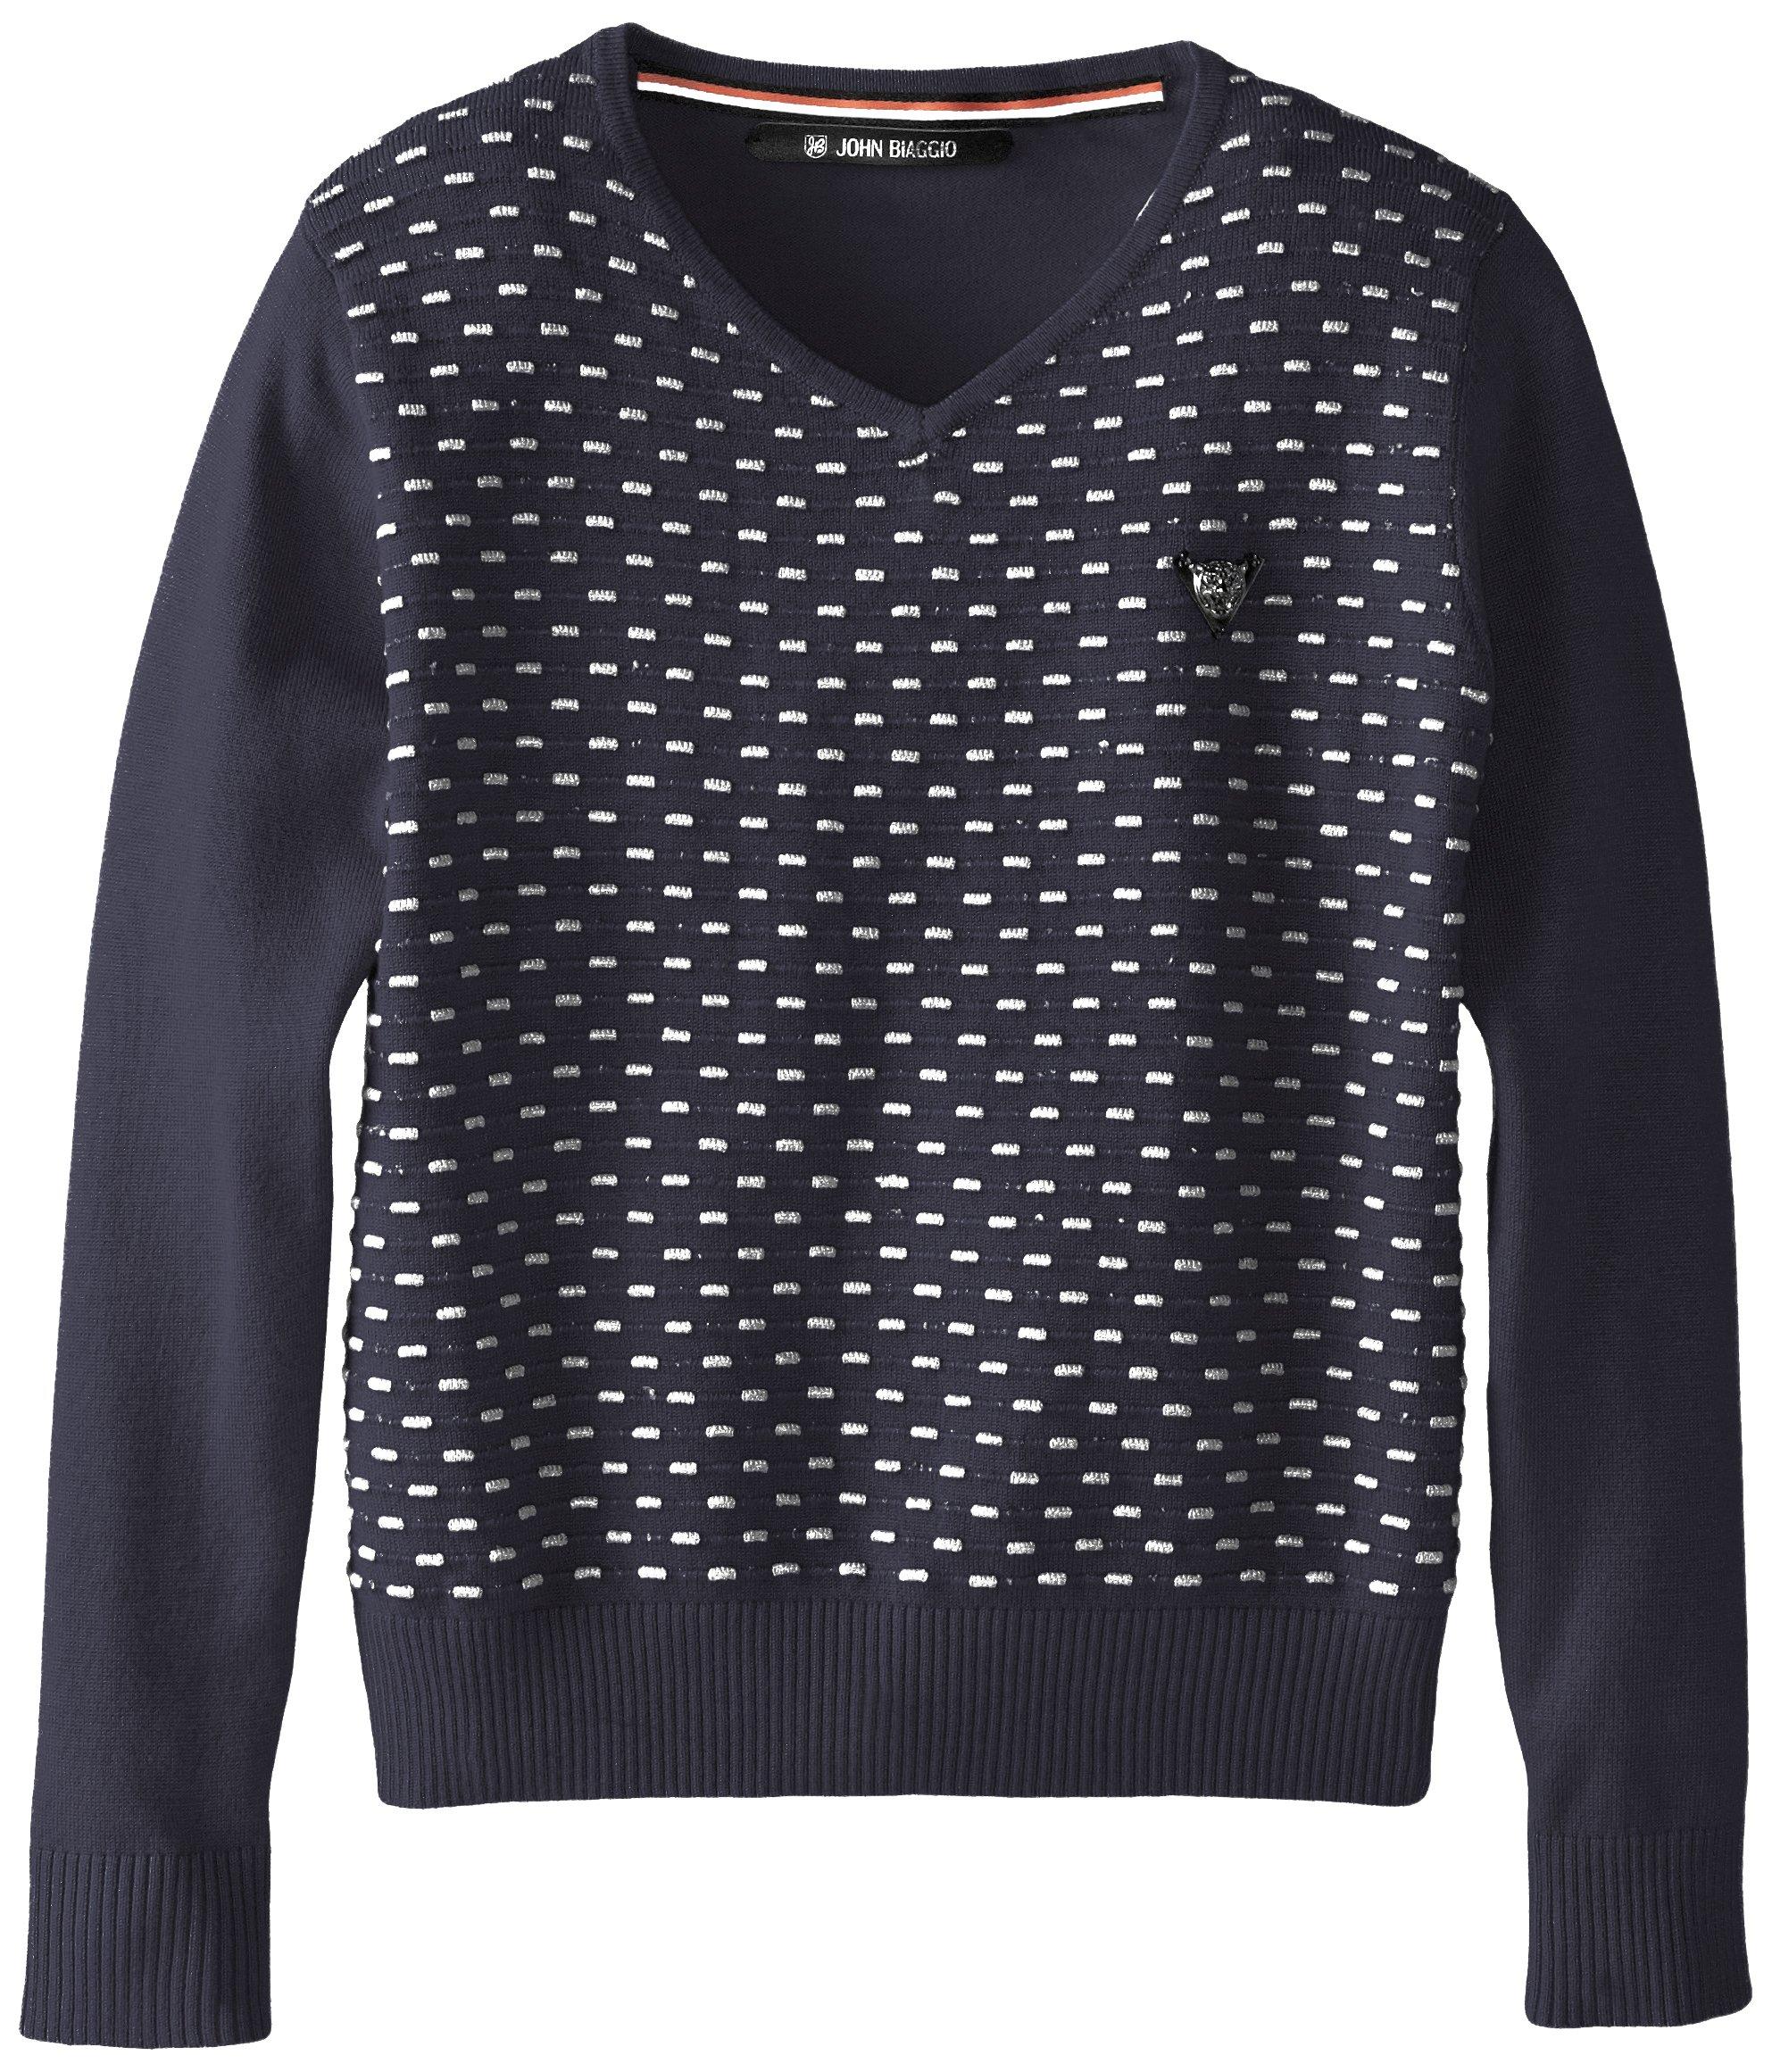 John Biaggio Little Boys V-Neck Parker Sweater, Navy, 6/7